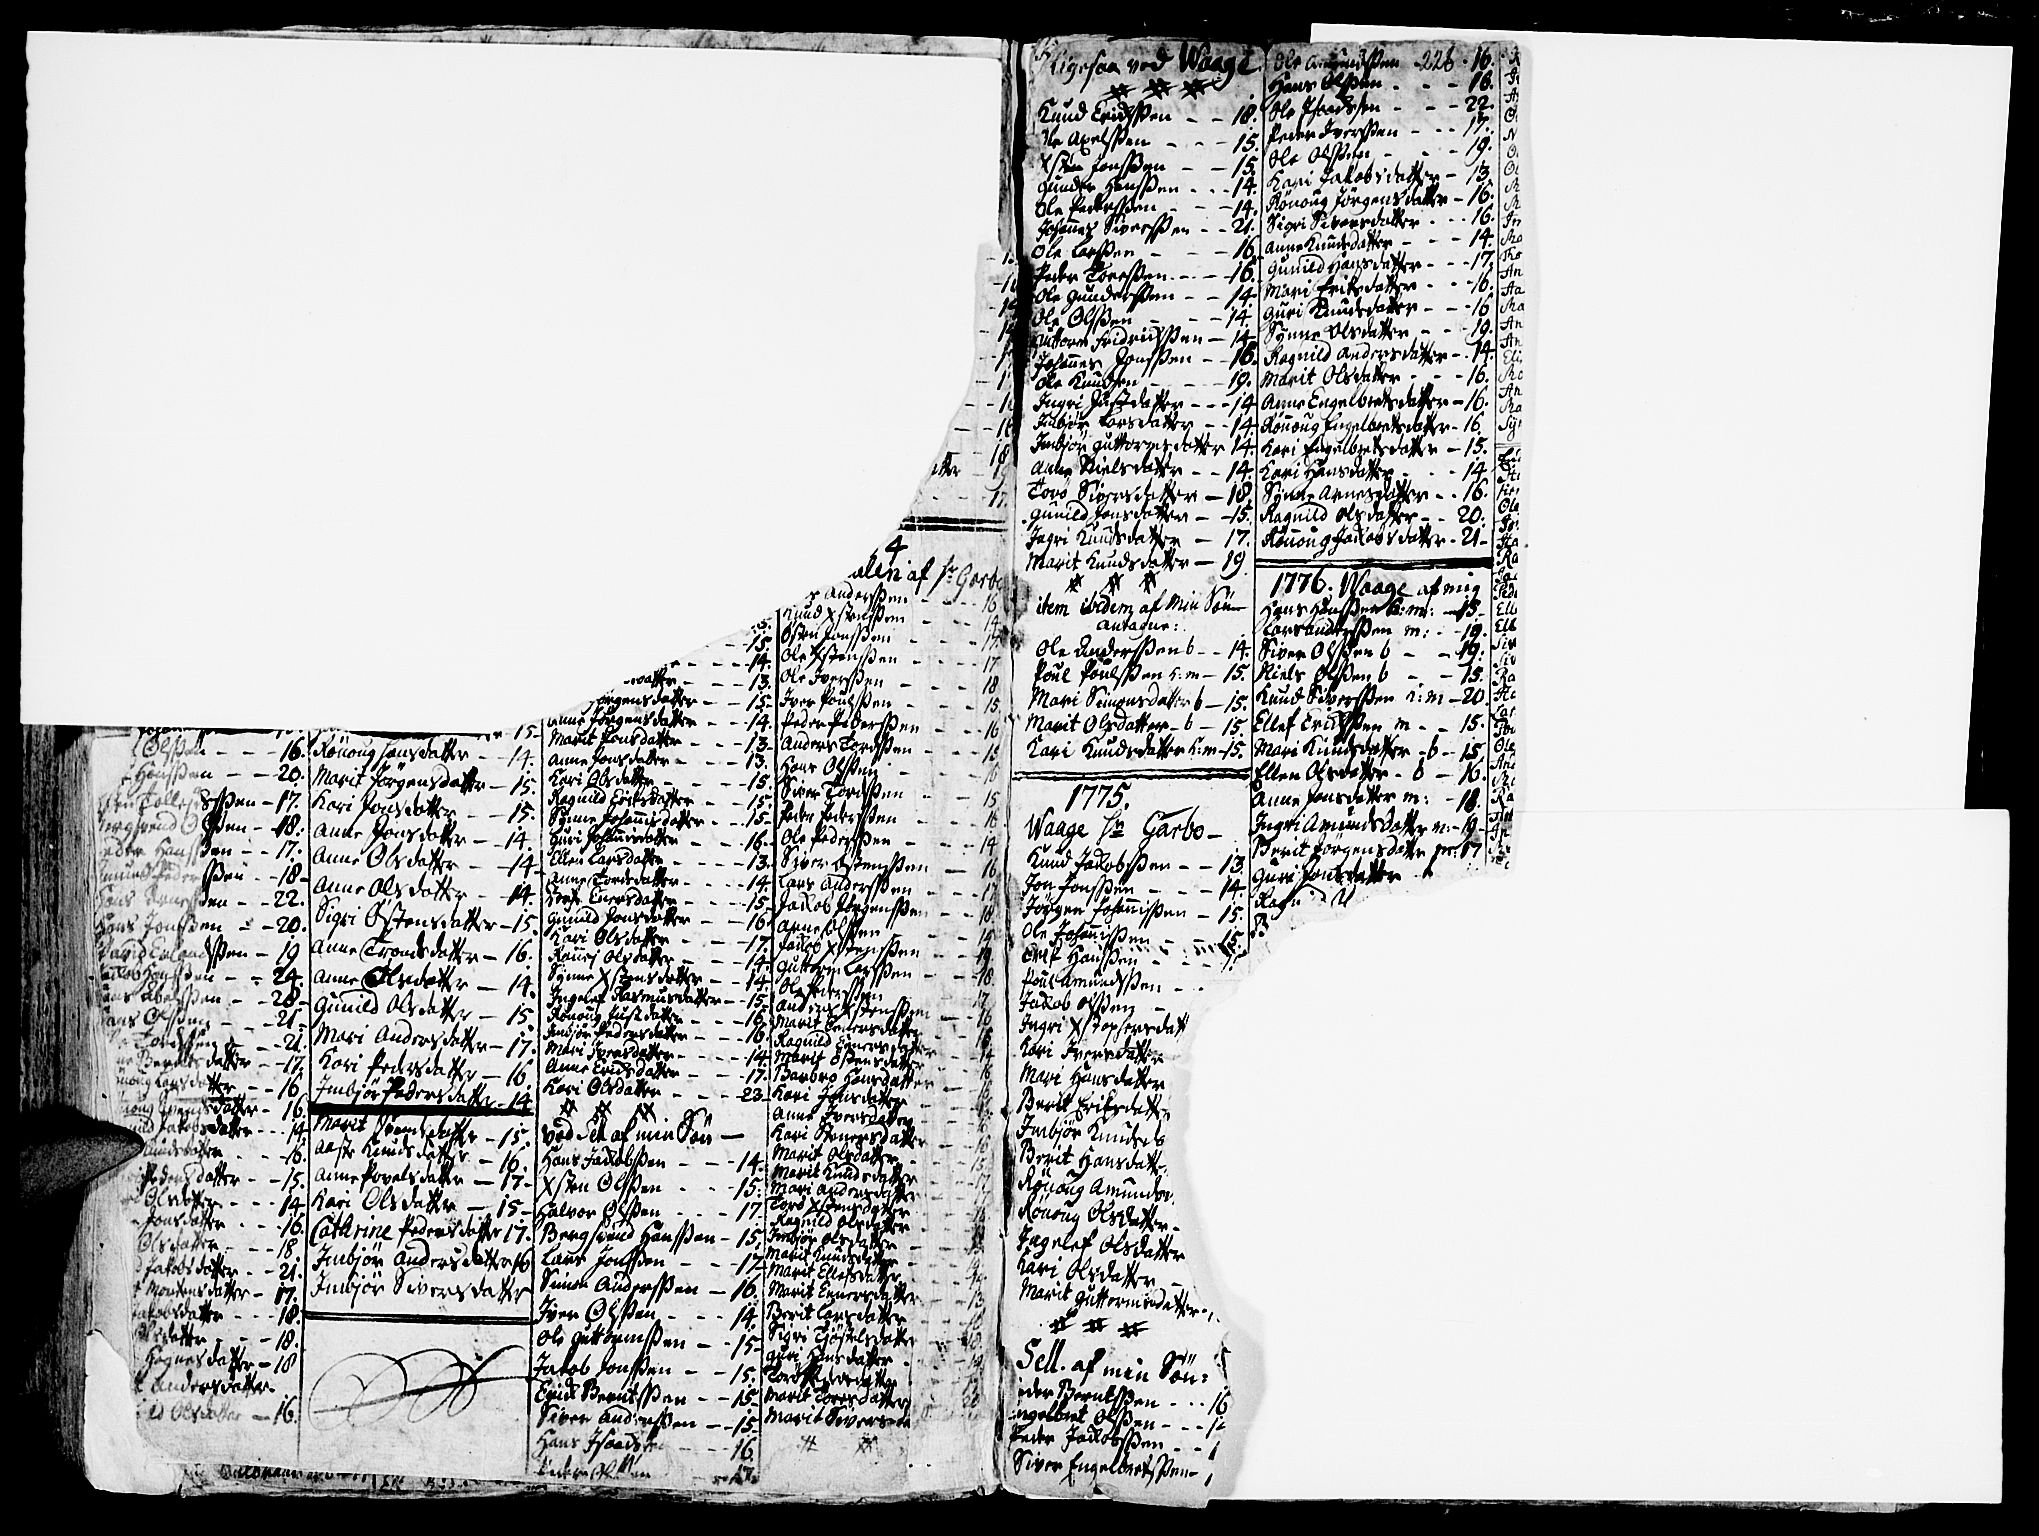 SAH, Vågå prestekontor, Ministerialbok nr. 1, 1739-1810, s. 228